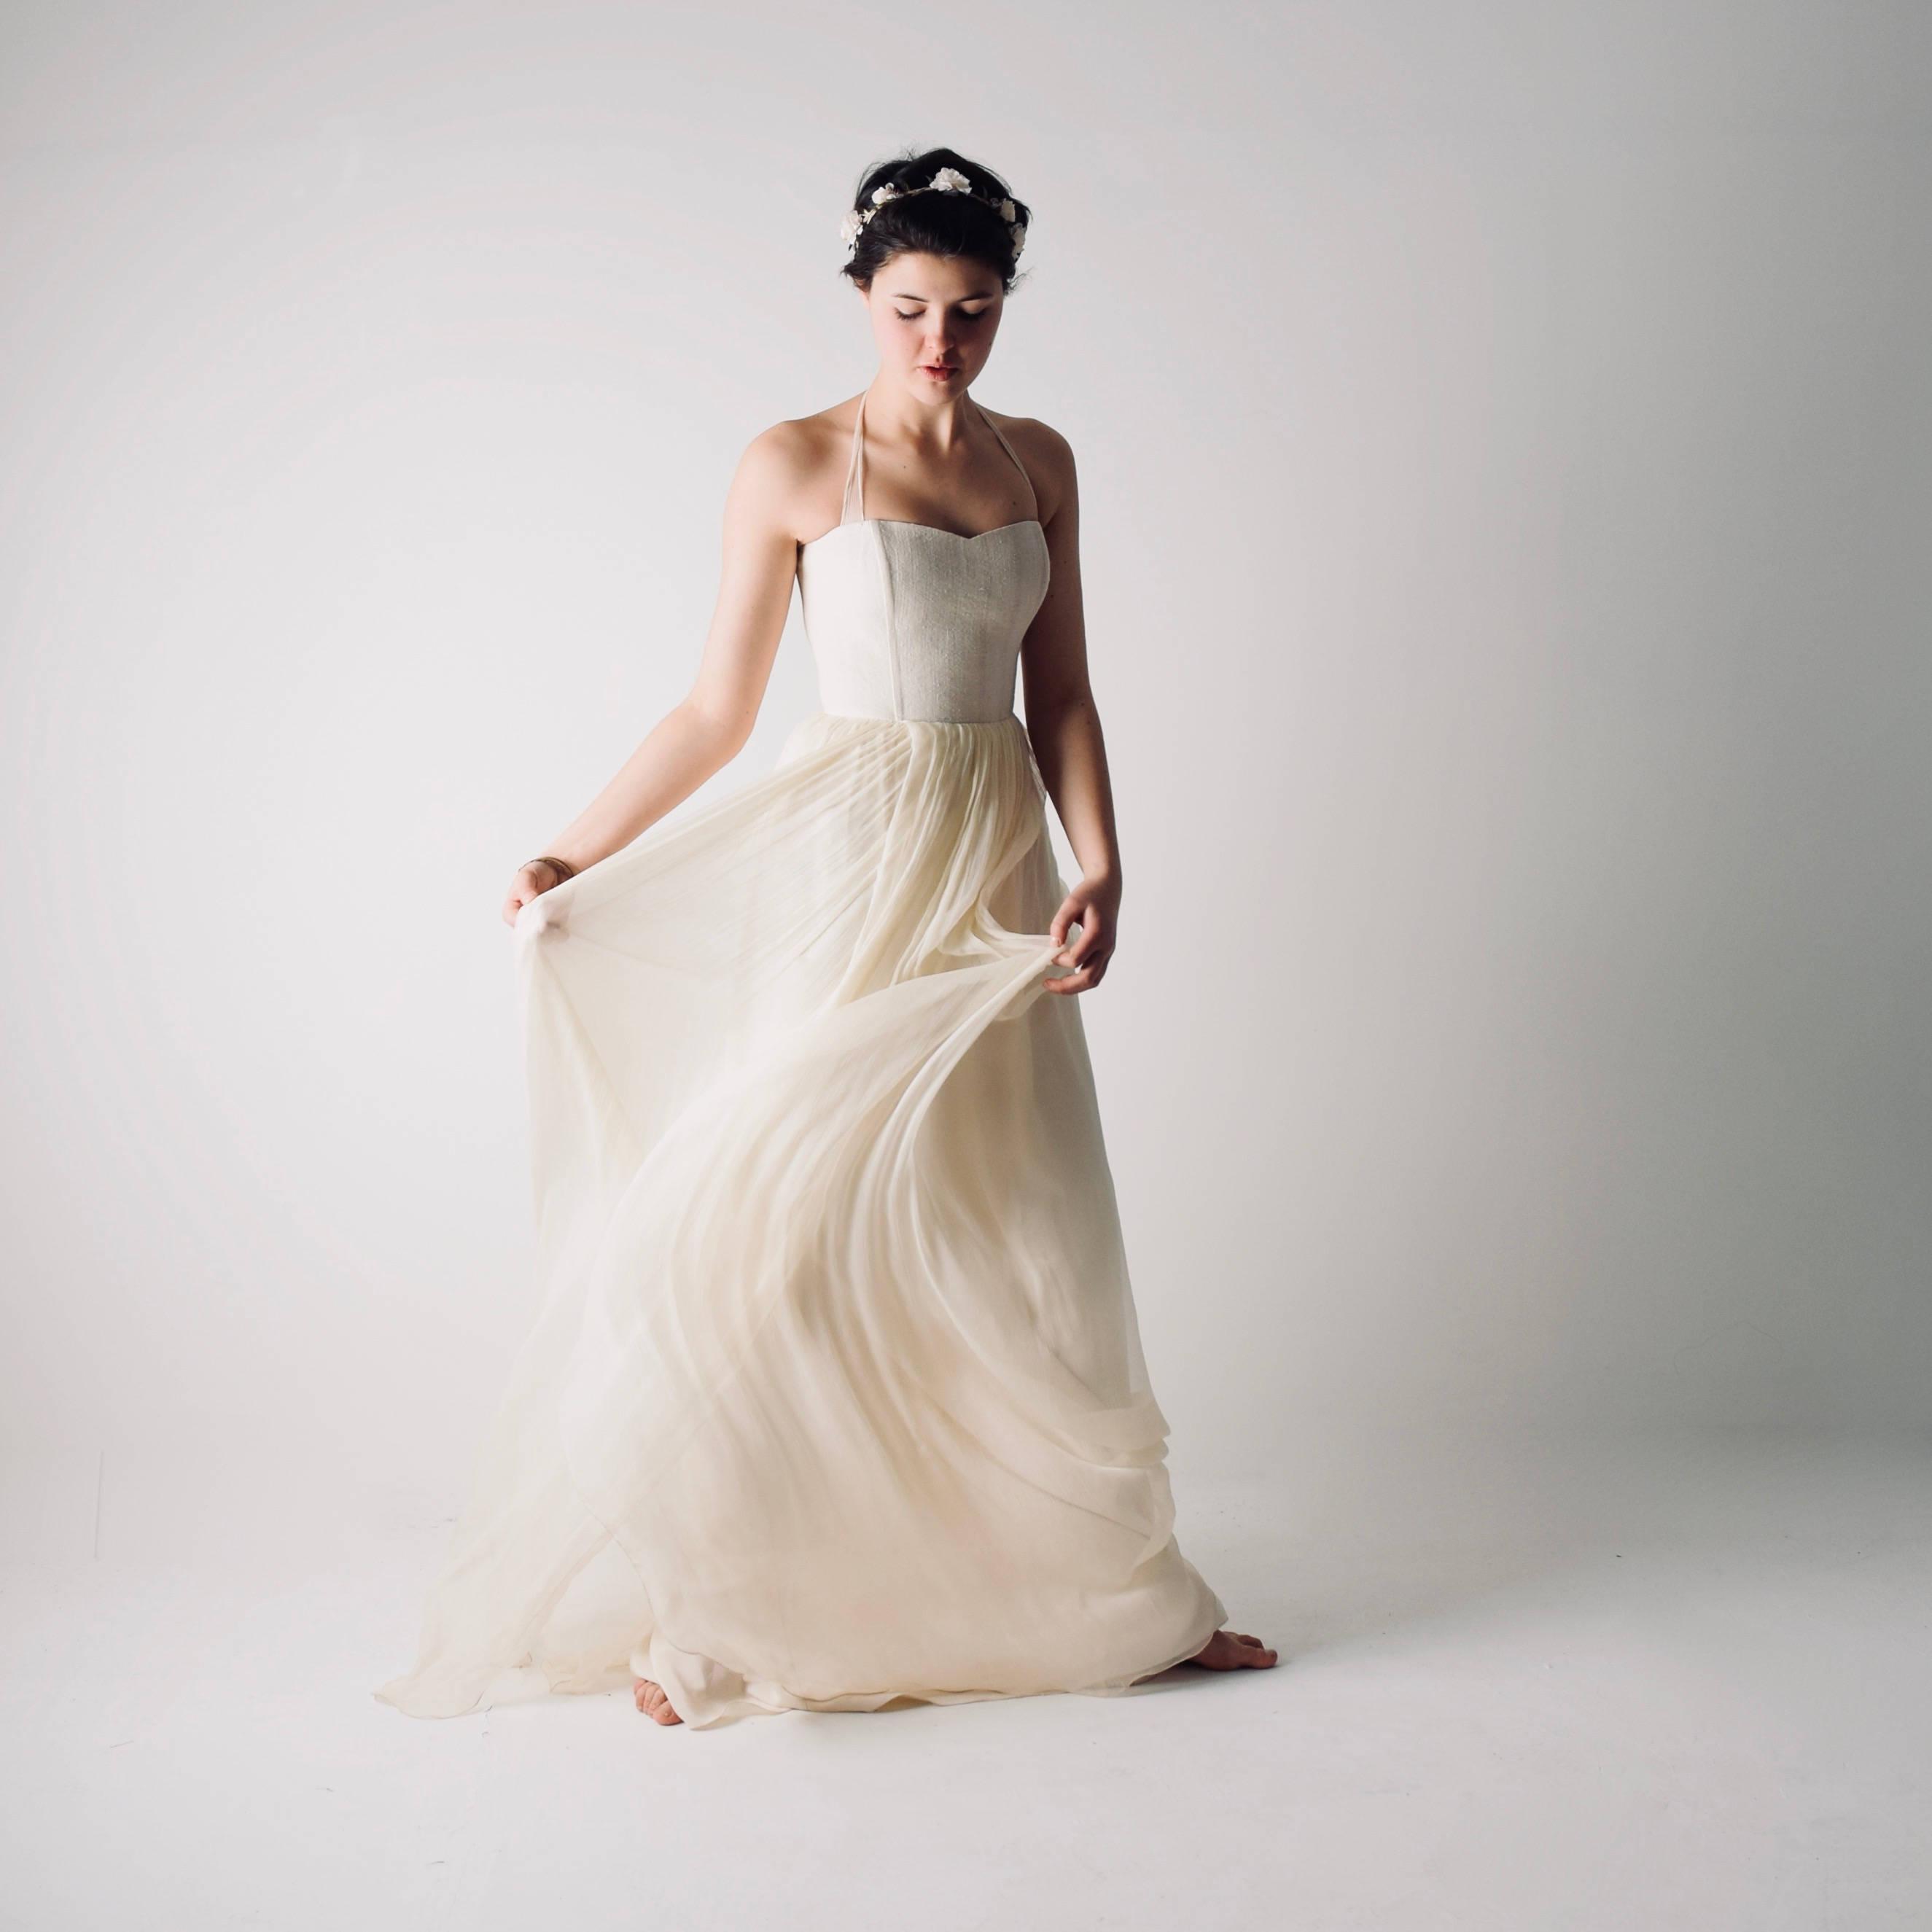 Tilia hemp wedding dress larimeloom handmade clothing tilia hemp and silk wedding dress junglespirit Choice Image